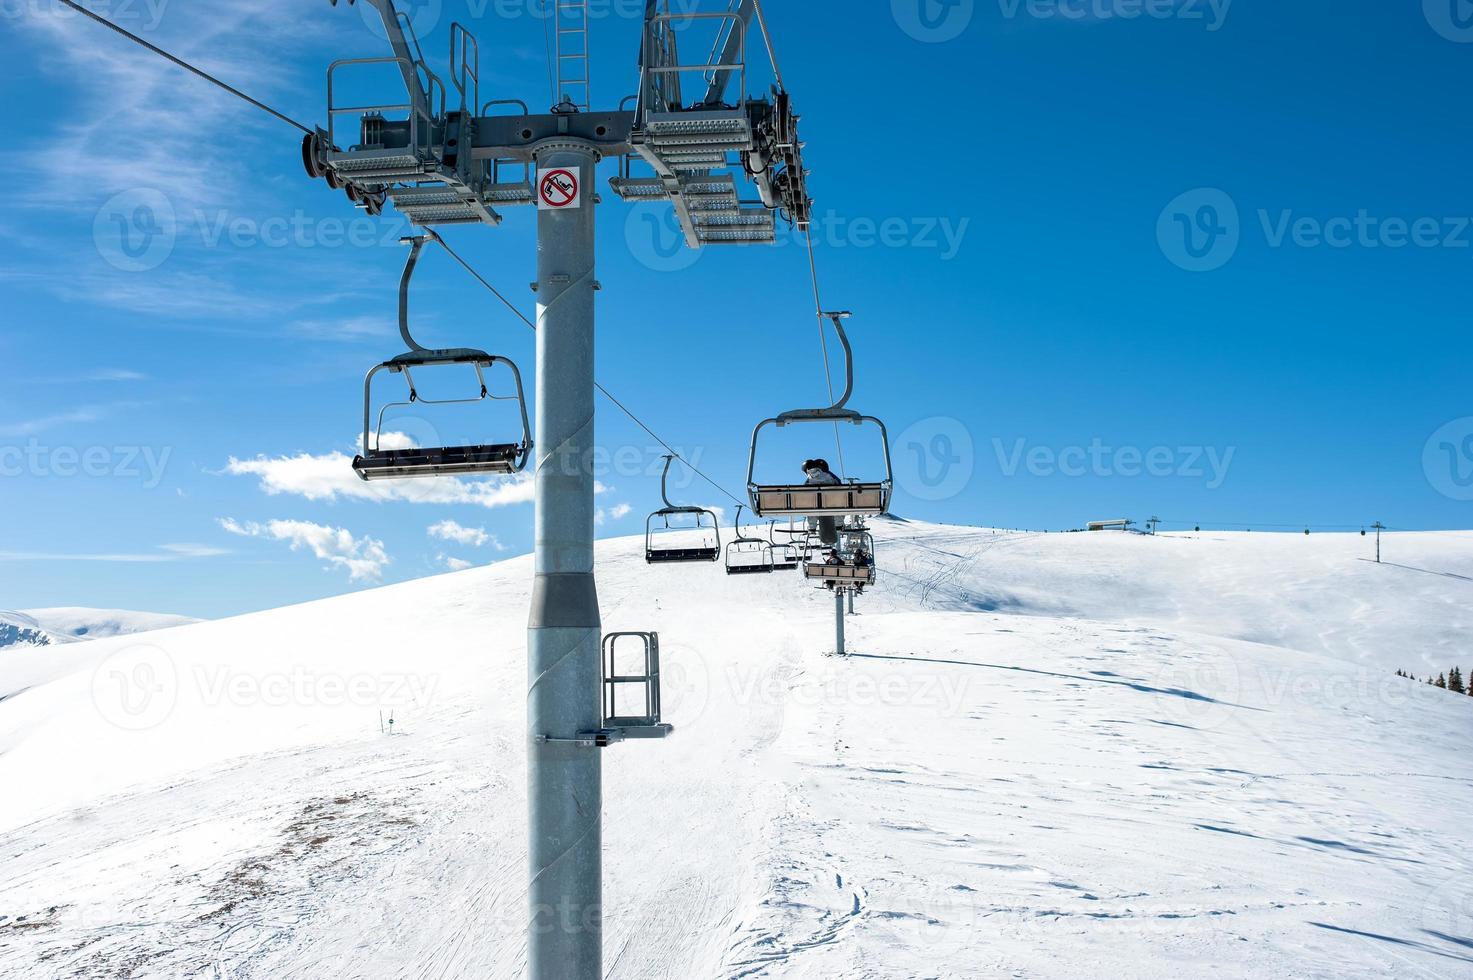 Chairlift on ski slope in mountain resort photo